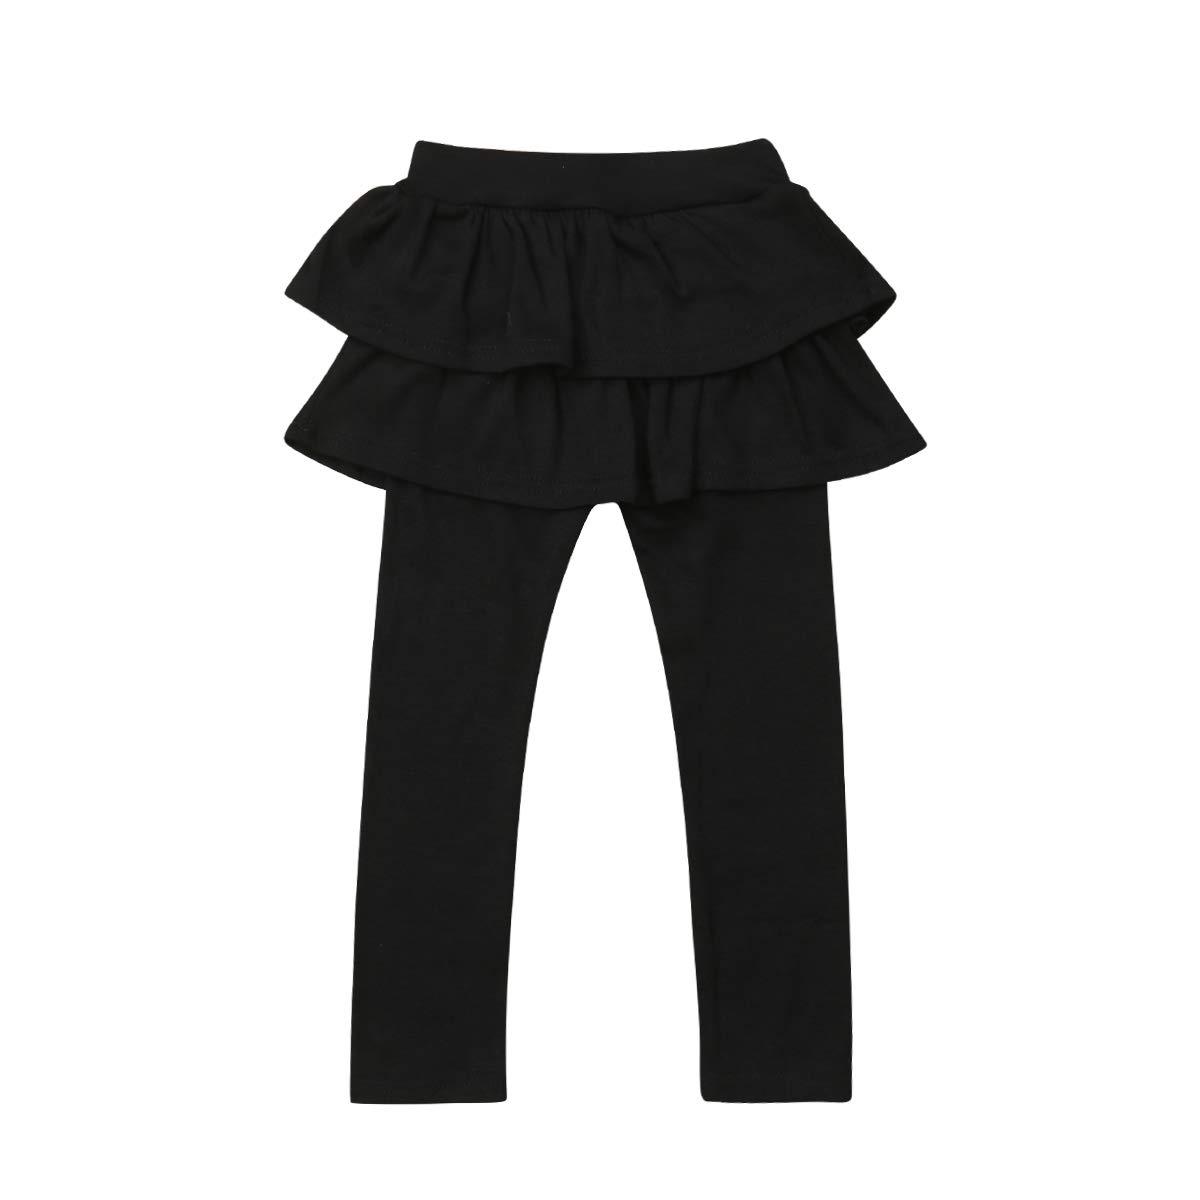 Orz.orange Kids Girls Lace Ruffle Leggings Gauze Culottes Tutu Skirt Leggings Pants